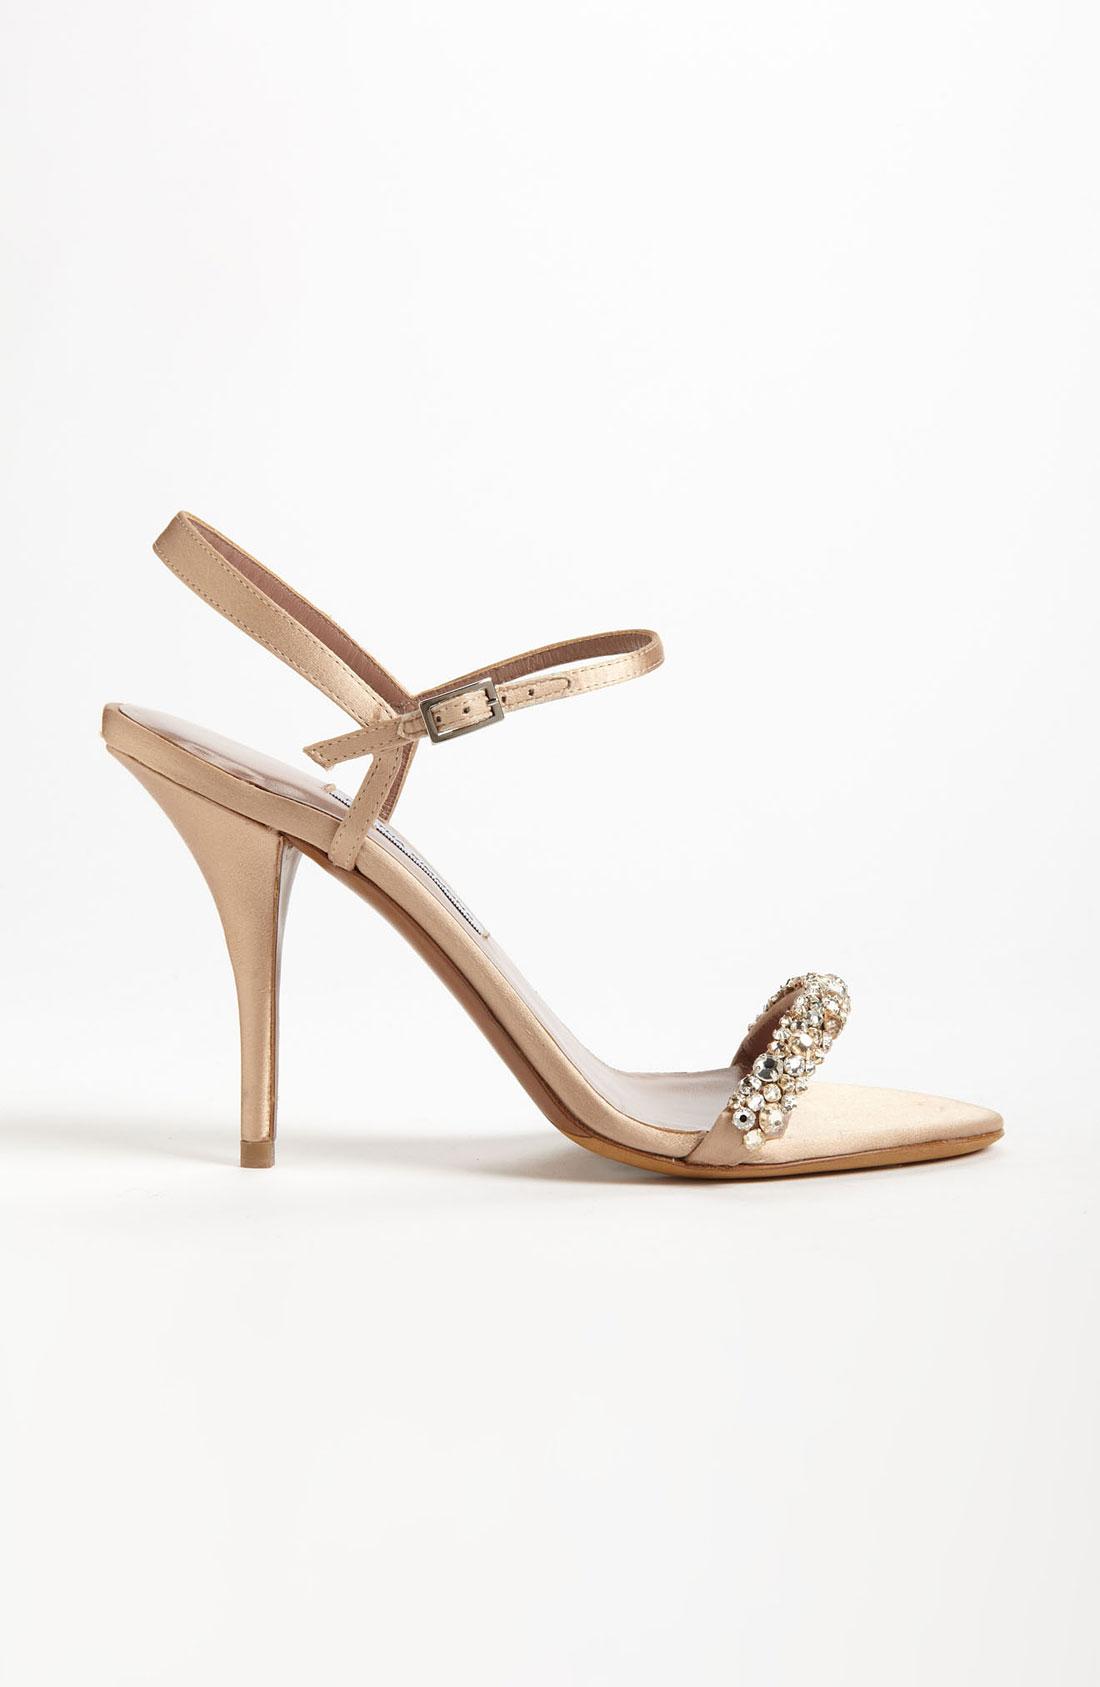 Nude Bridesmaid Heels - Is Heel